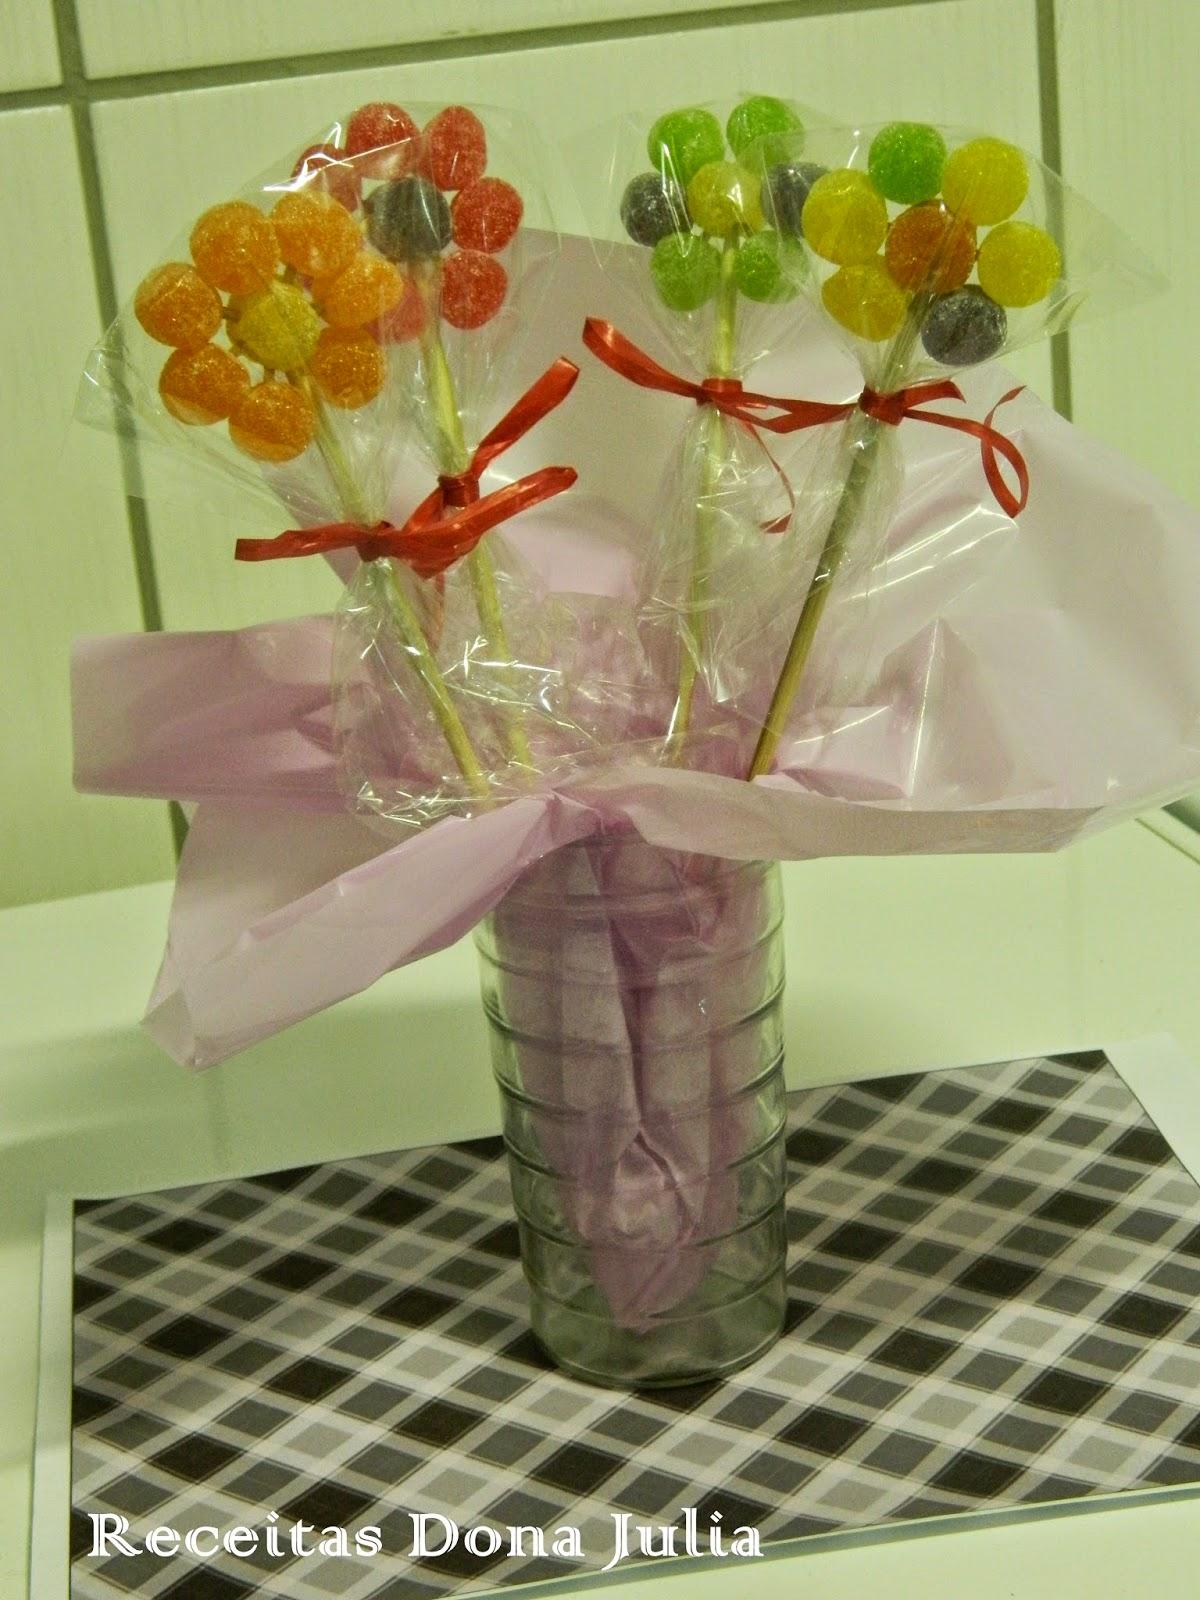 Flor de jujuba ou bala de goma